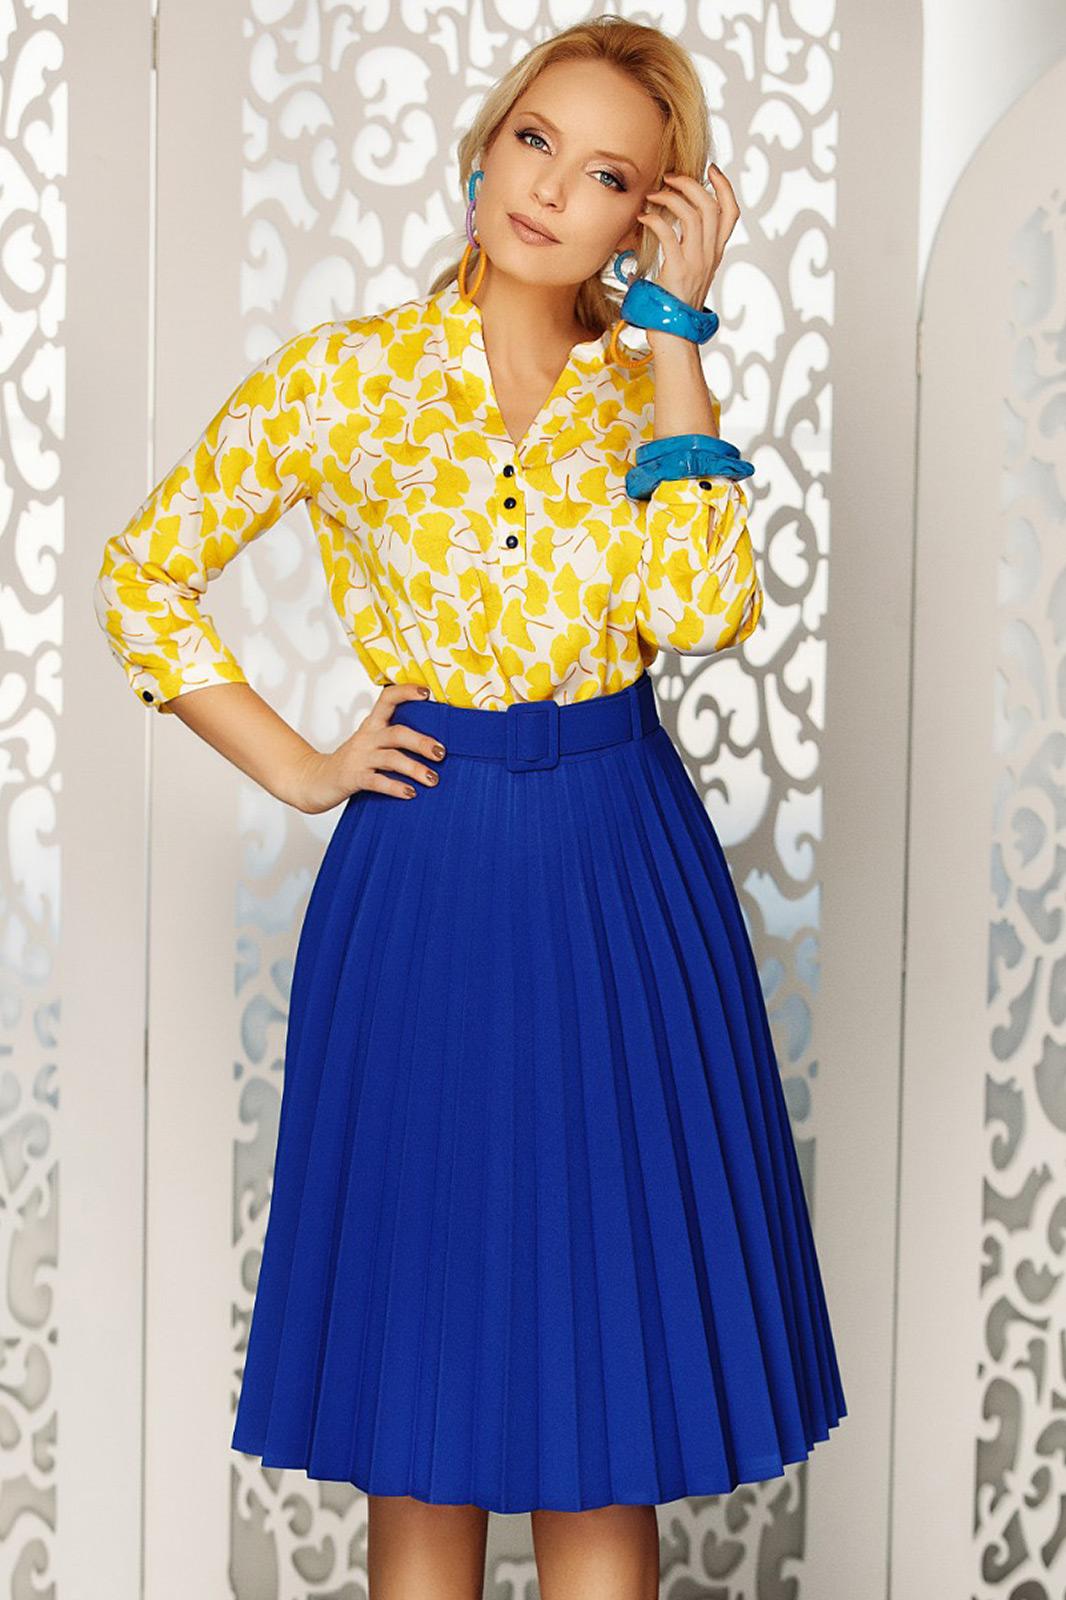 Fofy blue elegant folded up cloche skirt high waisted accessorized with belt slightly elastic fabric